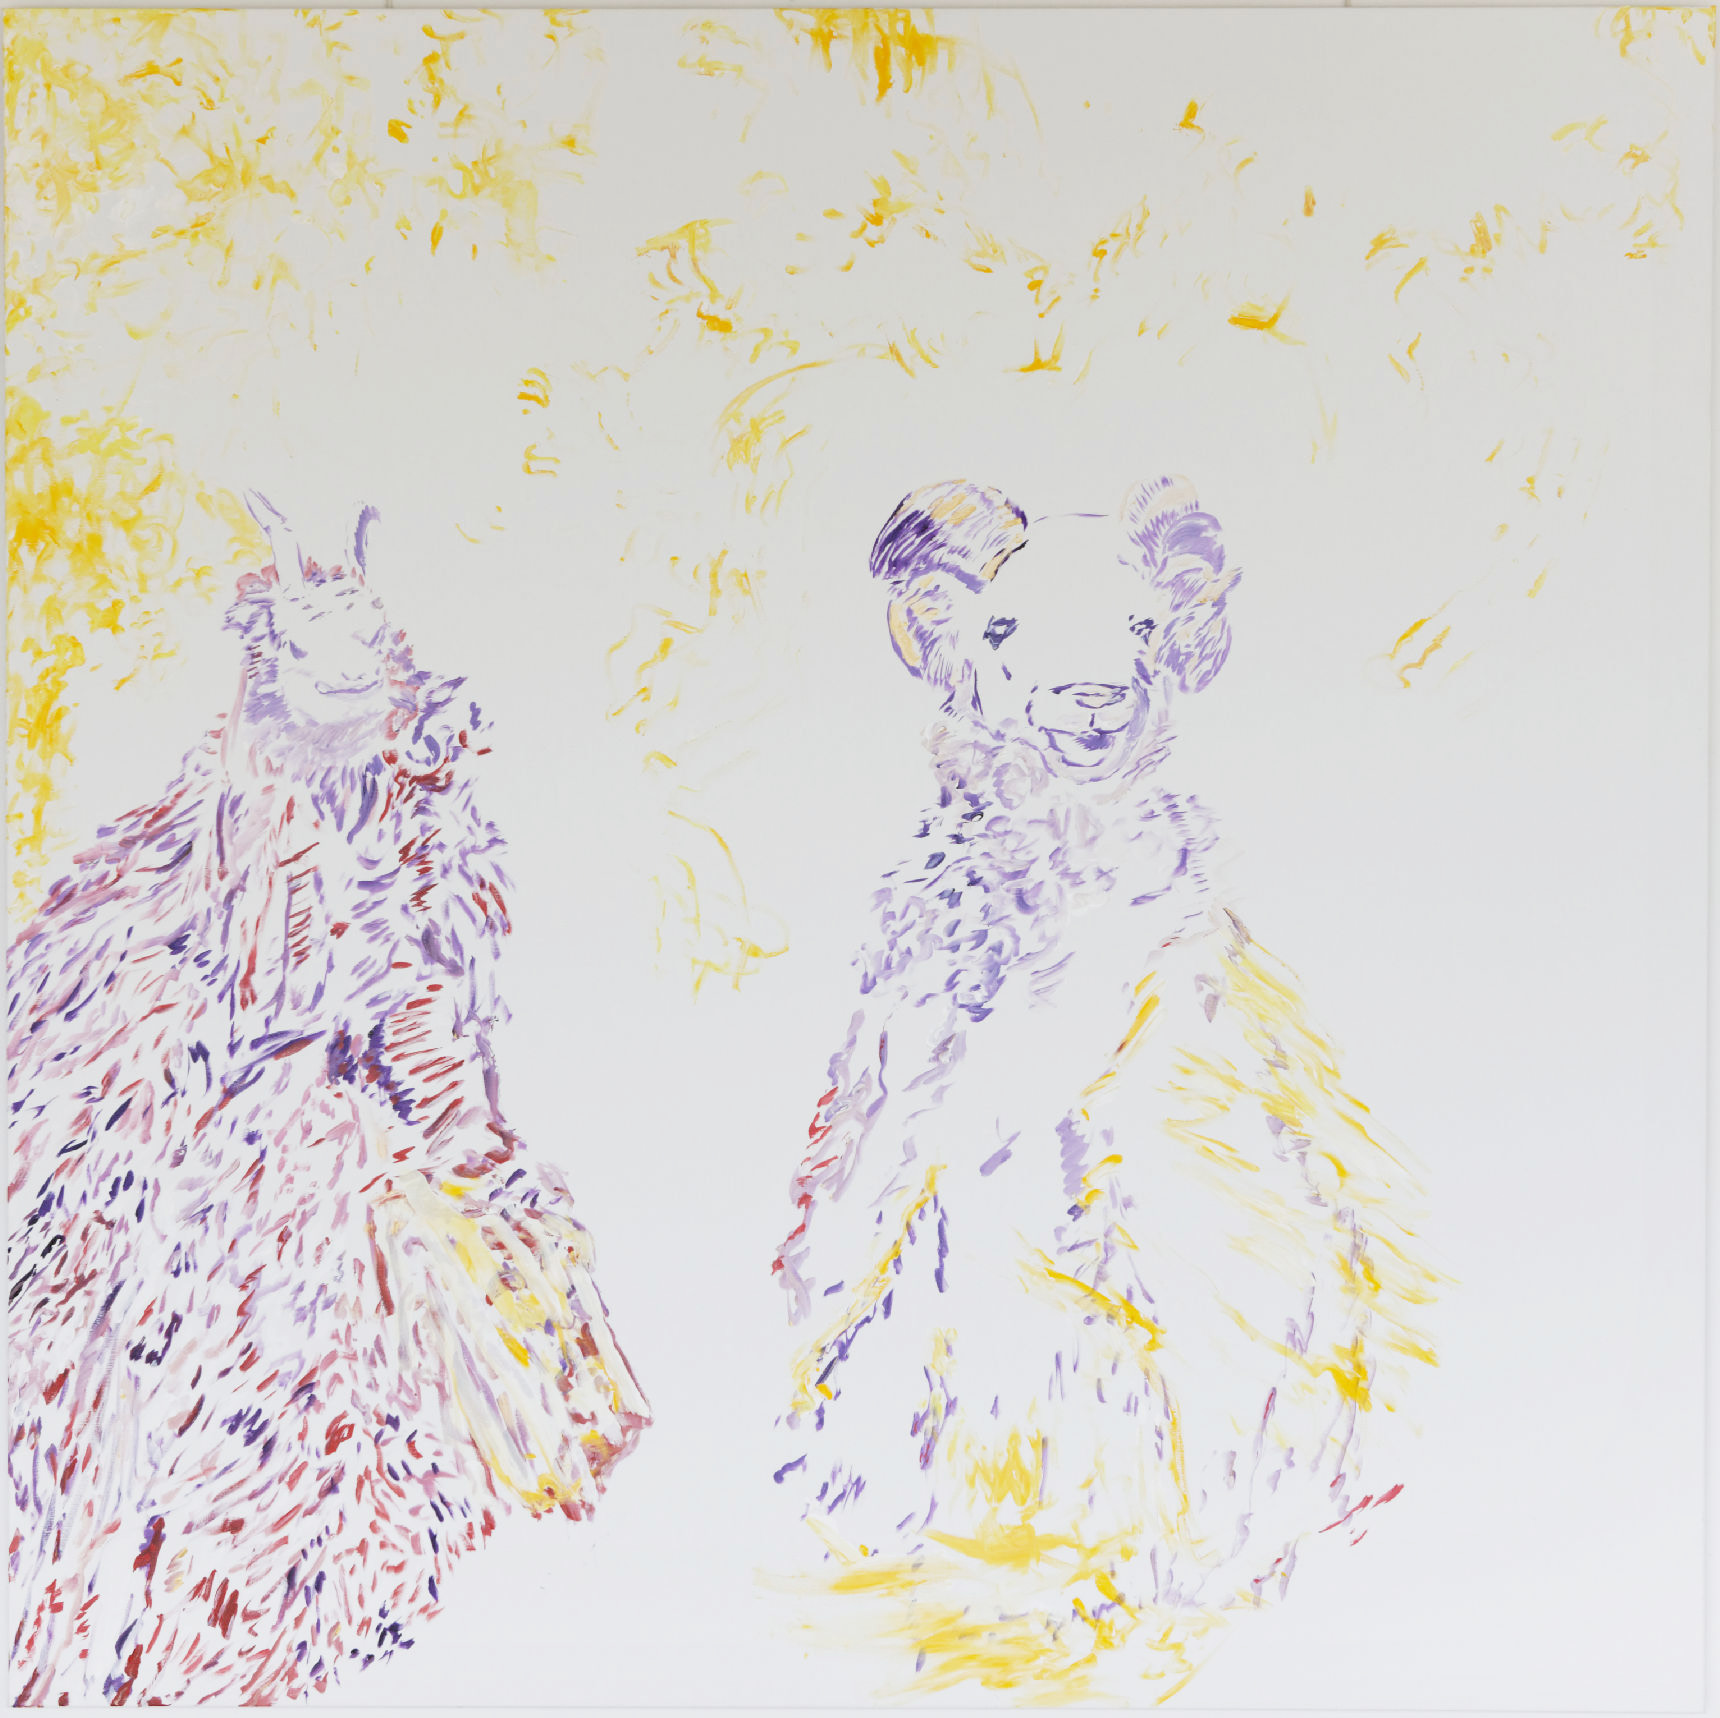 Las Madridas (acrylic and mixed media, 200 x 200 cm - 2014)